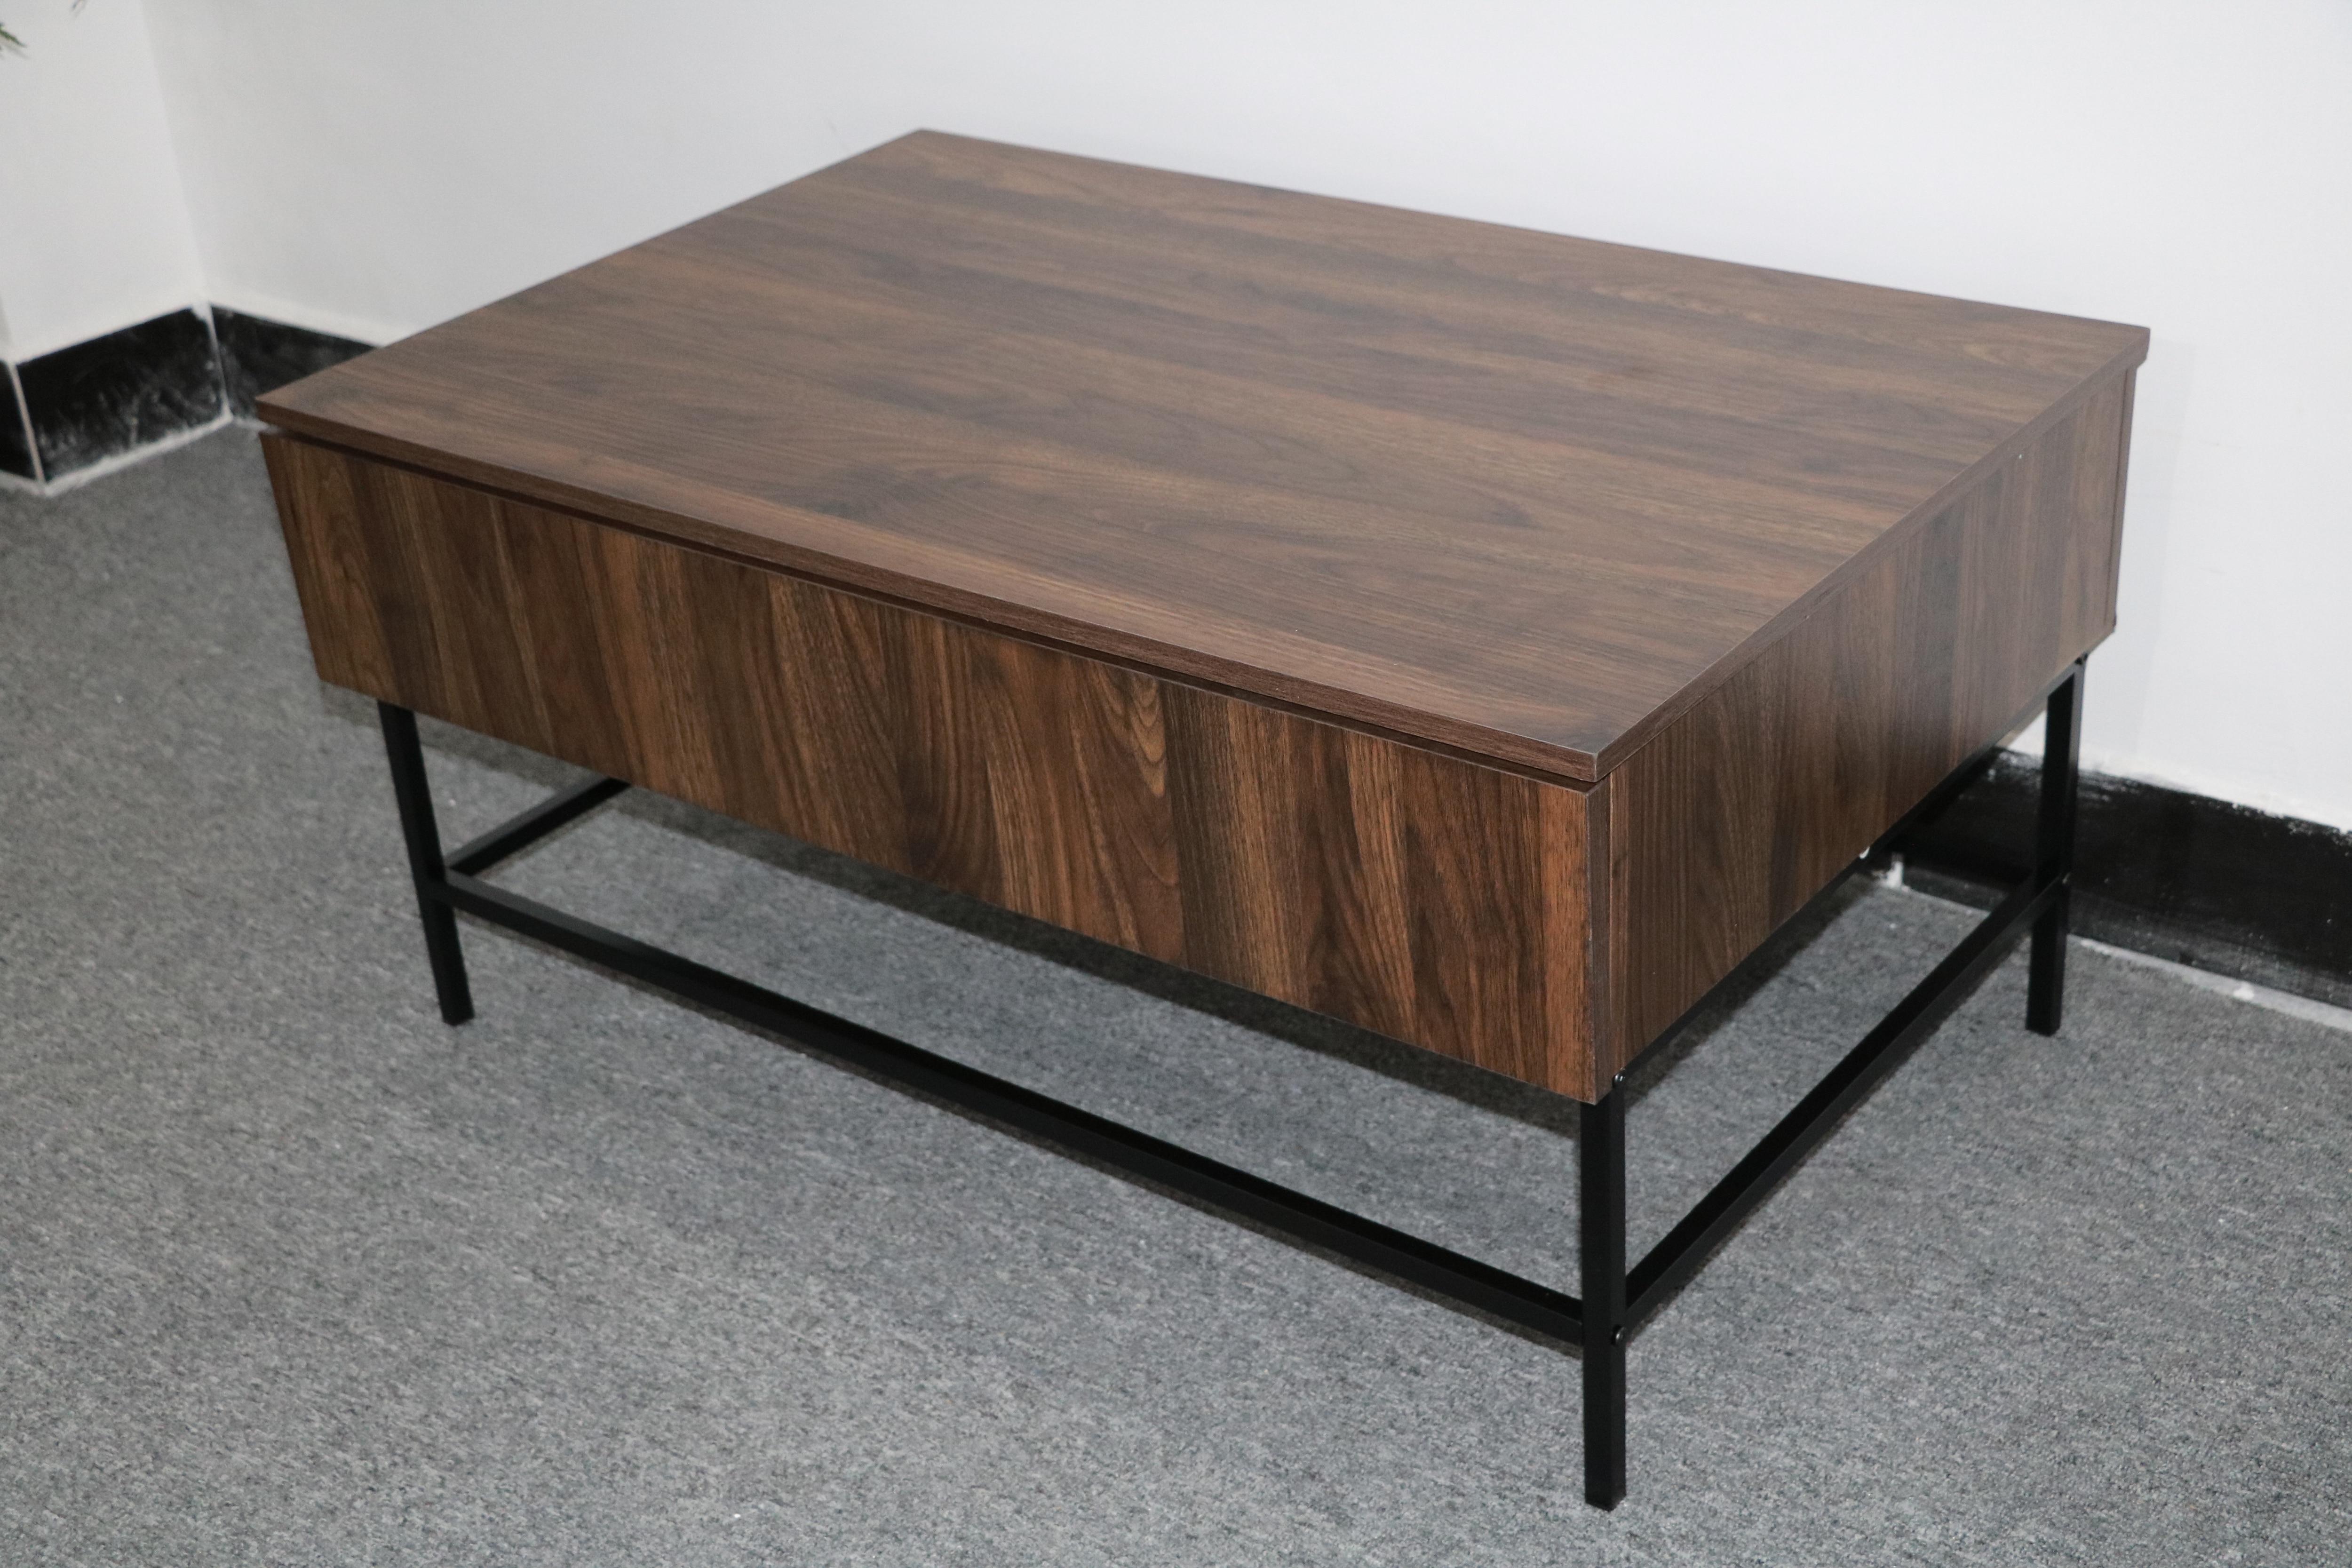 Coffee Table Basse De Salon Nordic Modern Tea Table Canyon Walnut Color Mesa De Centro Mesa Desk 2 Drawers 91x60x45cm Iron Legs Coffee Tables Aliexpress